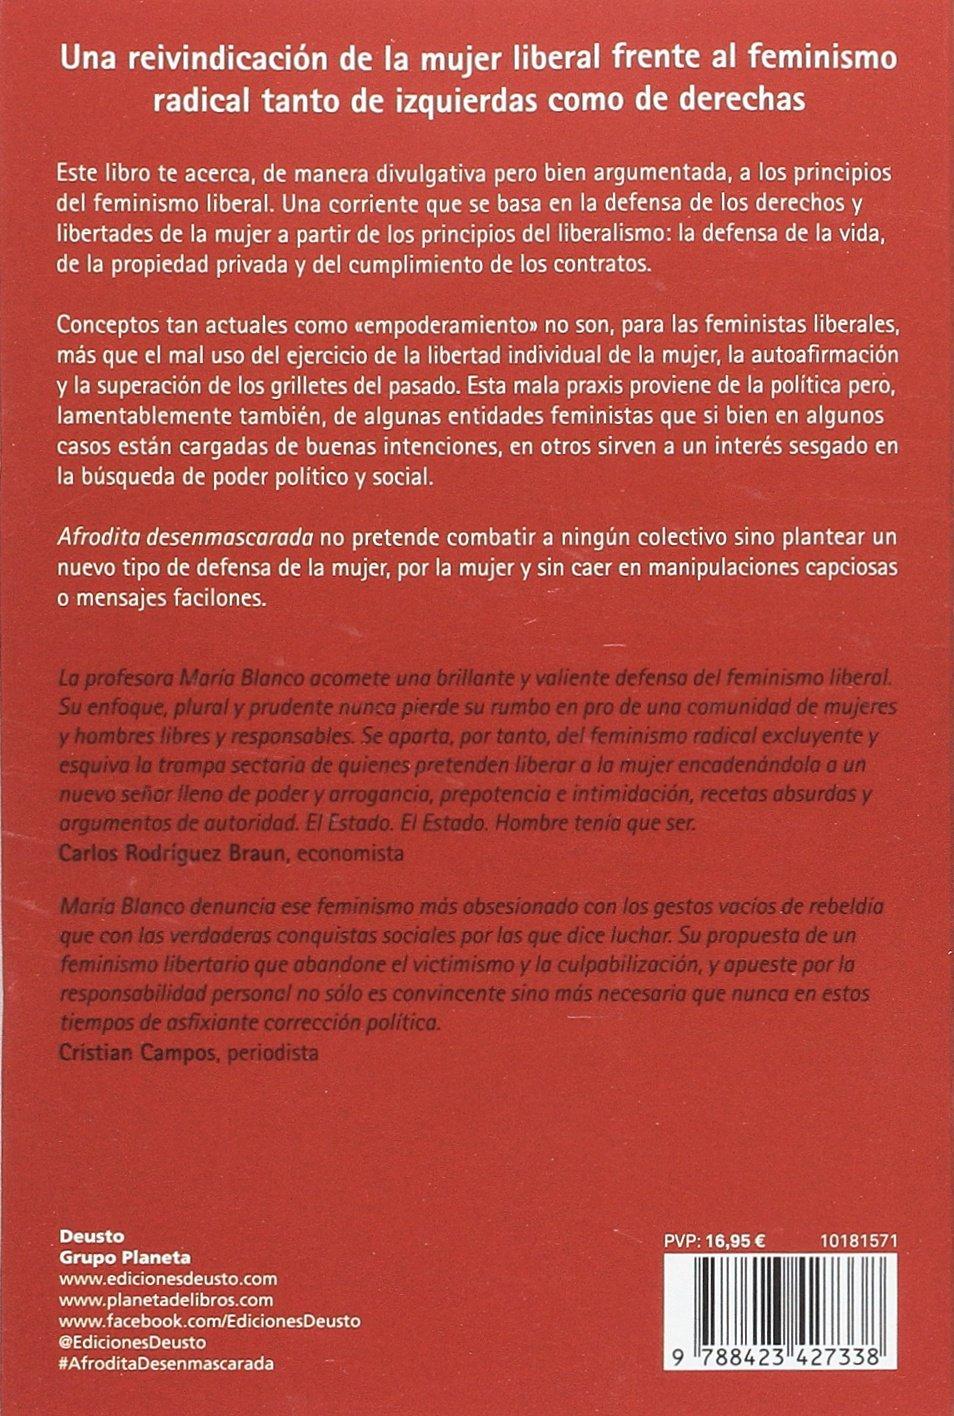 Afrodita desenmascarada: Una defensa del feminismo liberal Sin colección: Amazon.es: María Blanco González: Libros